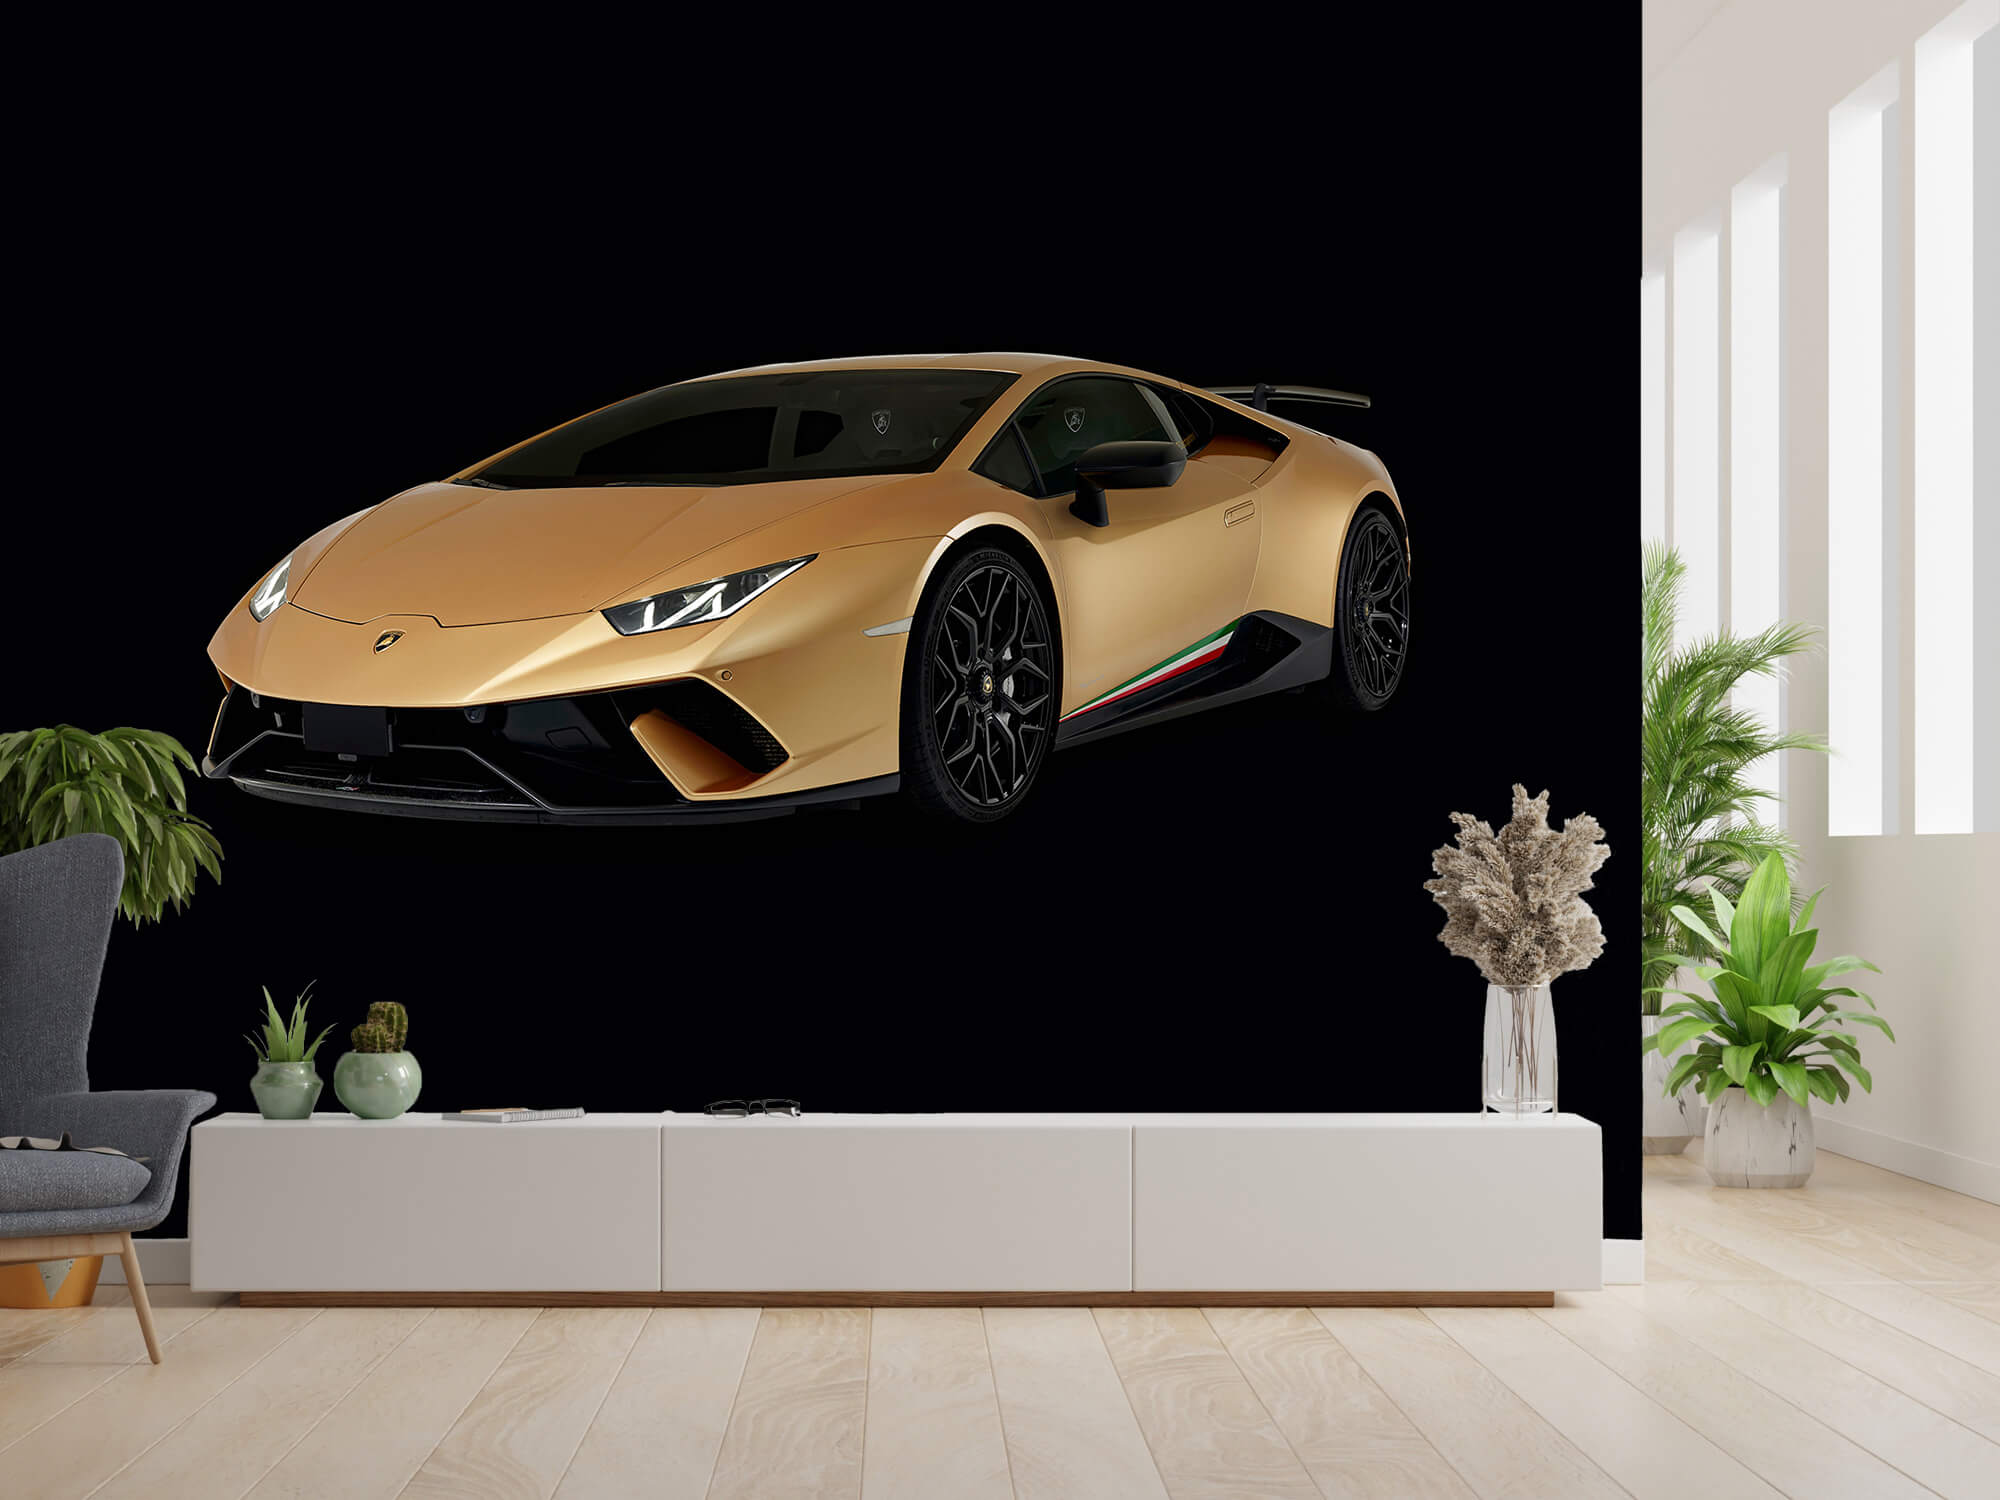 Wallpaper Lamborghini Huracán - Rechter voorkant, zwart 4